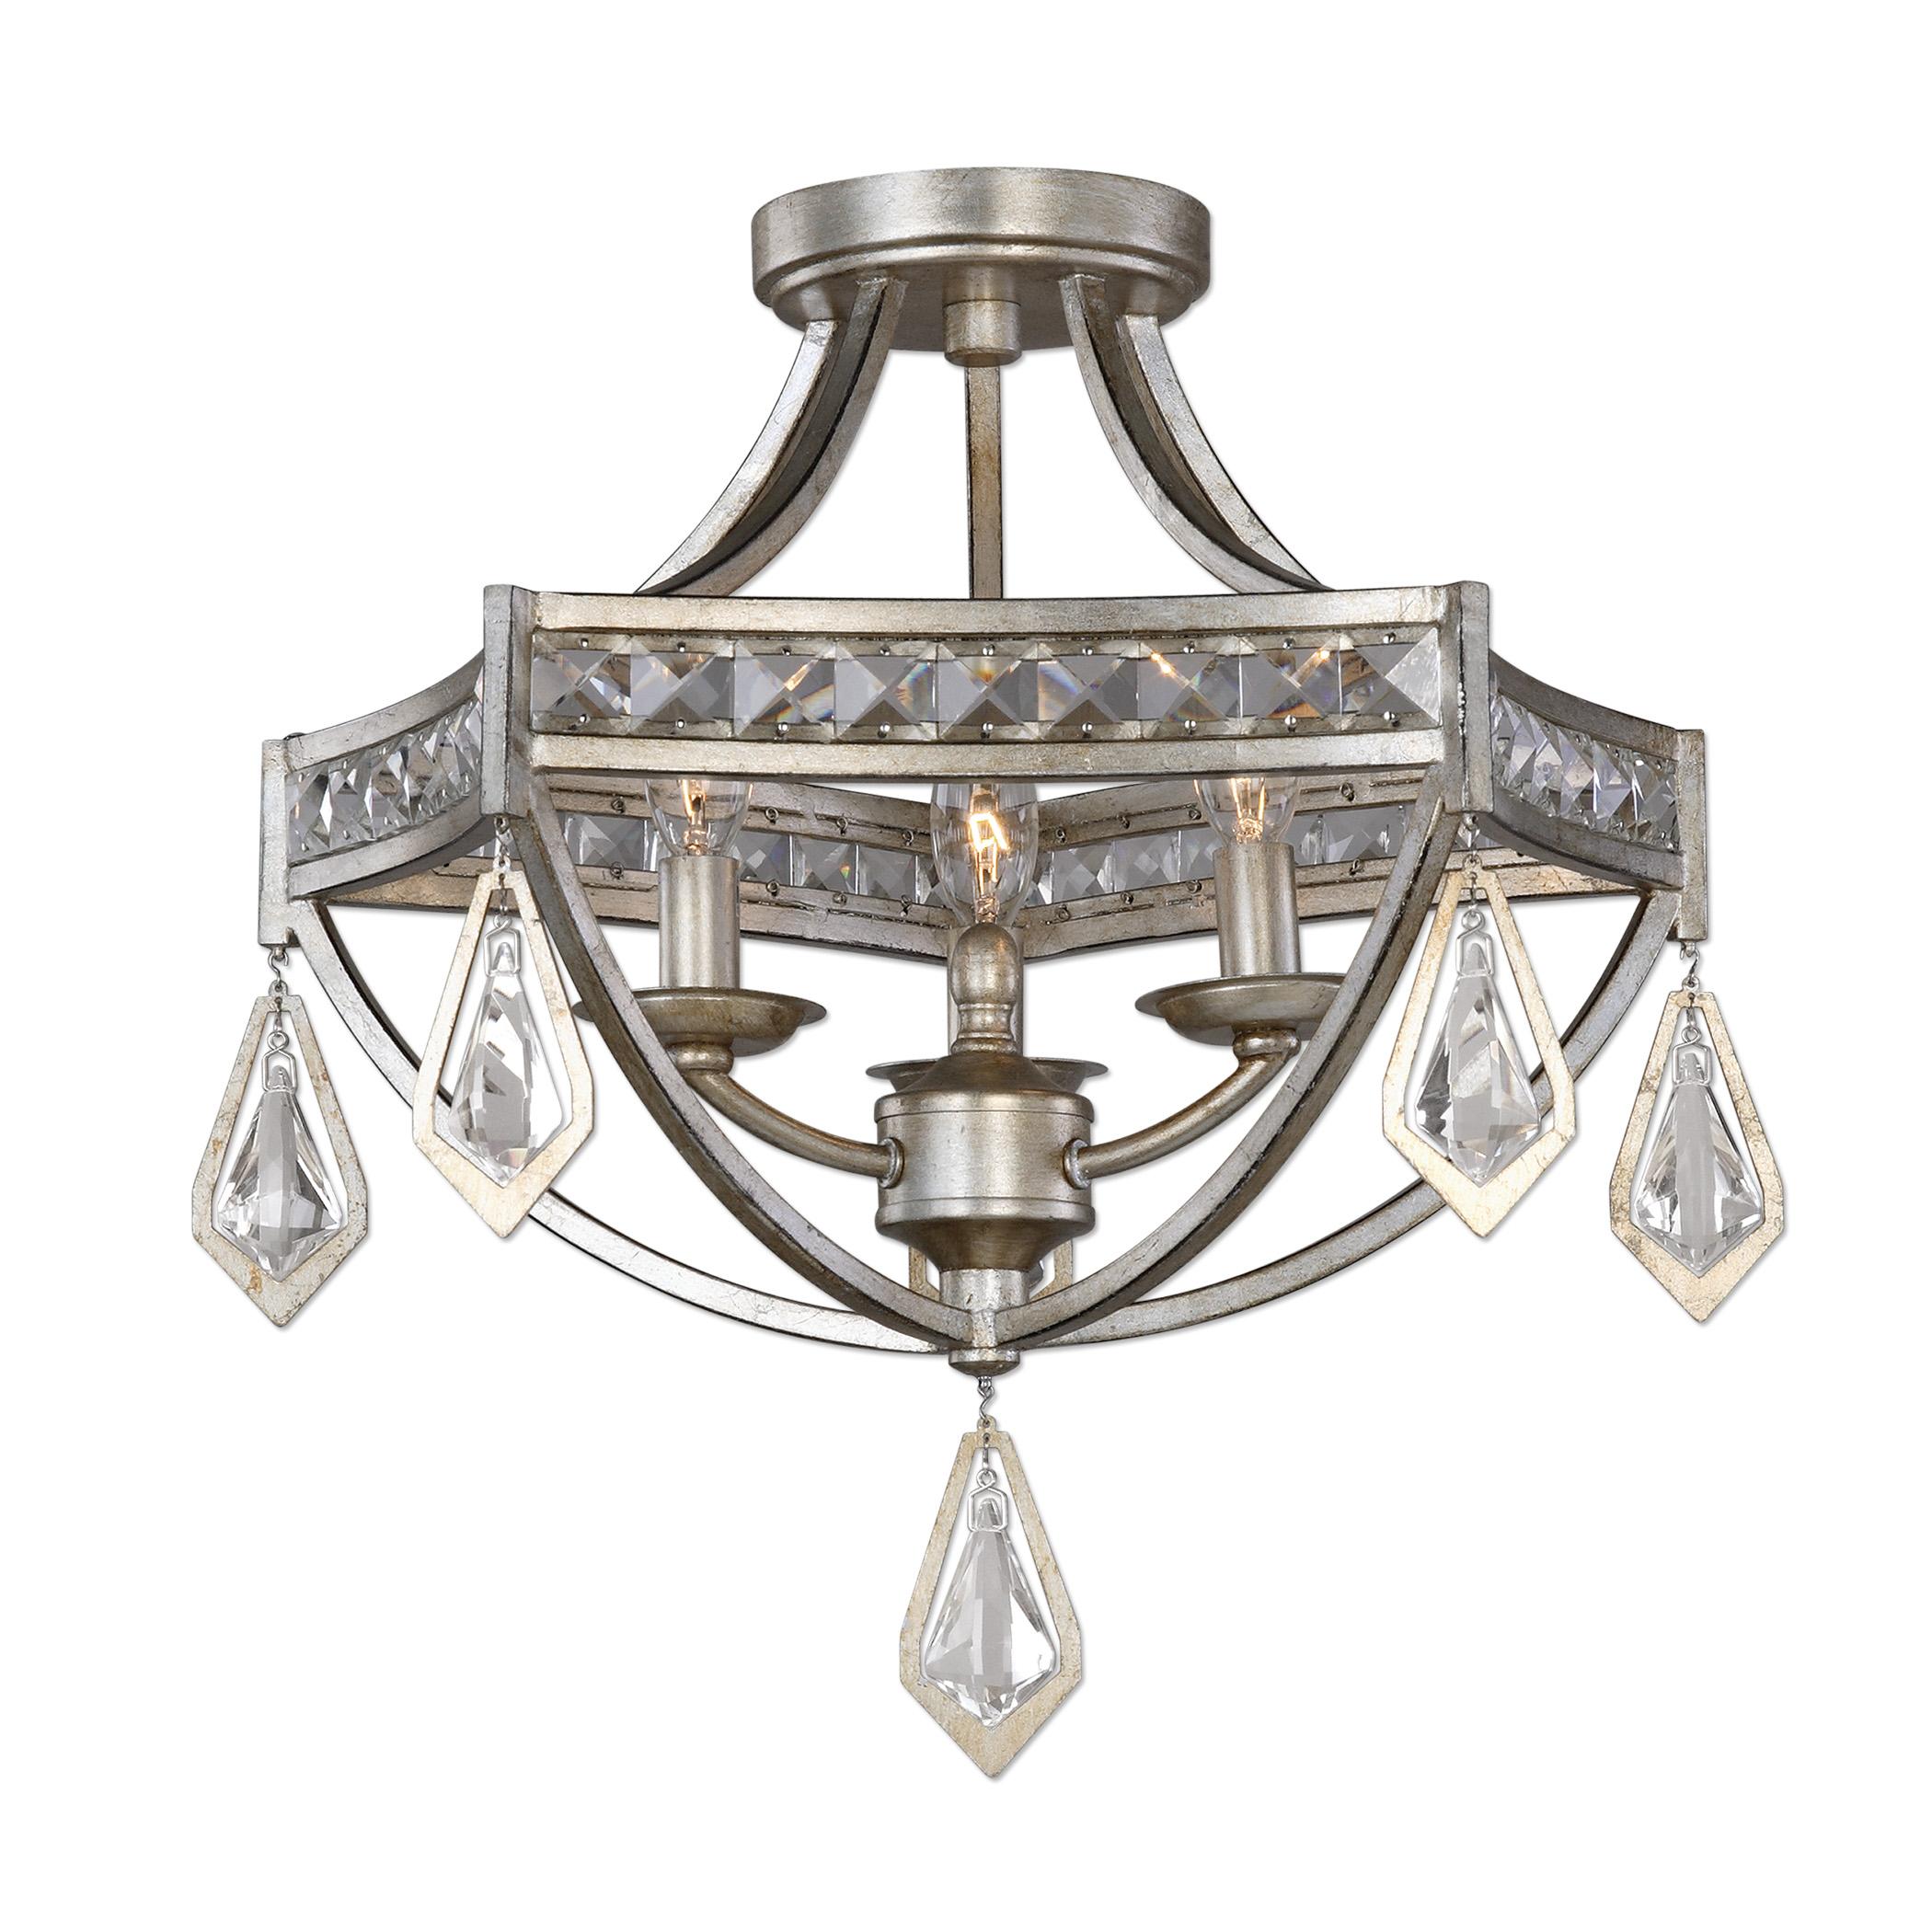 Uttermost Lighting Fixtures Tamworth Modern 3 Light Semi Flush - Item Number: 22275